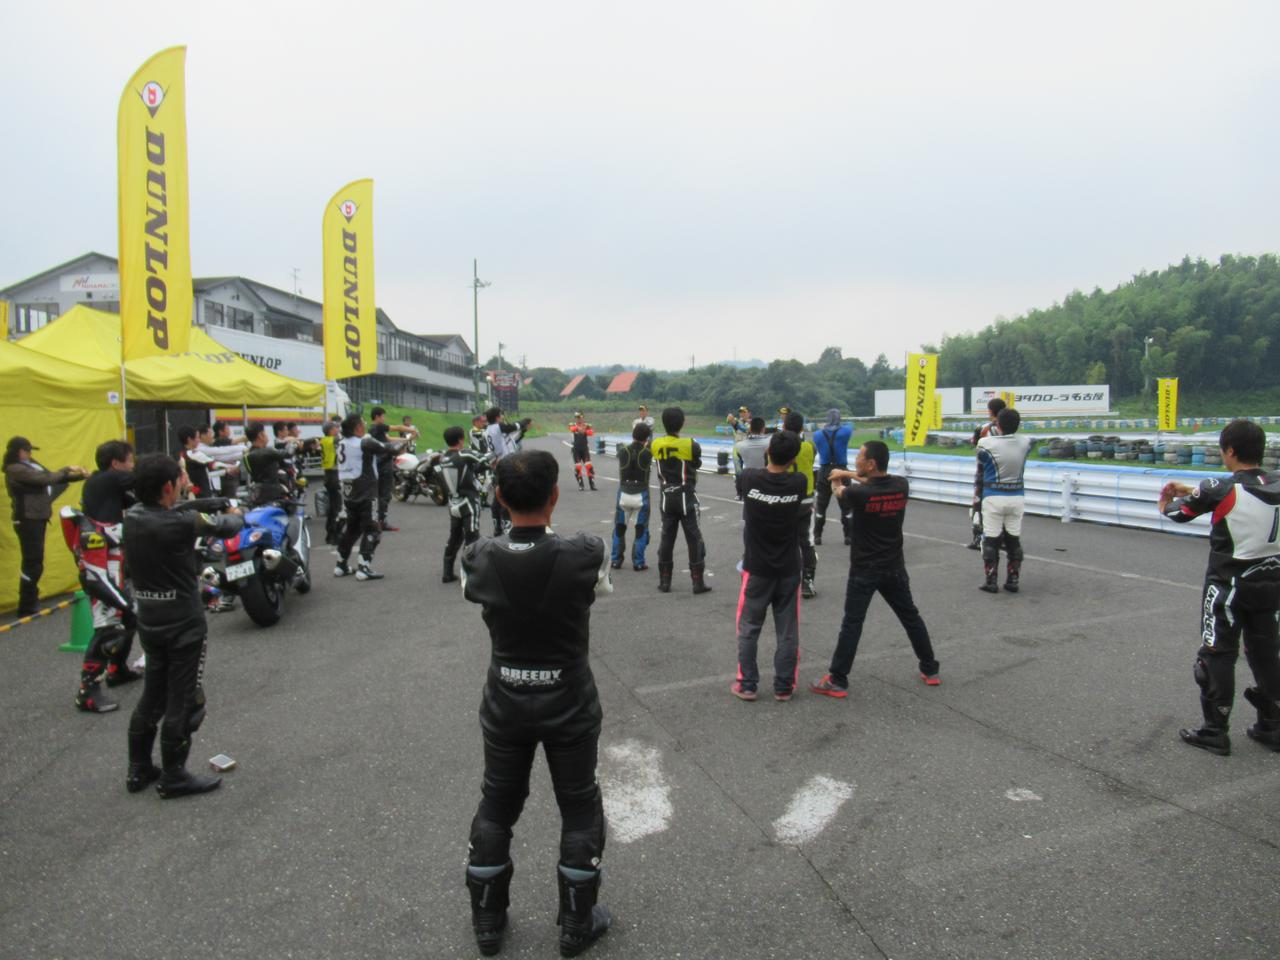 Images : 2番目の画像 - 過去に開催されたイベントの様子 - webオートバイ